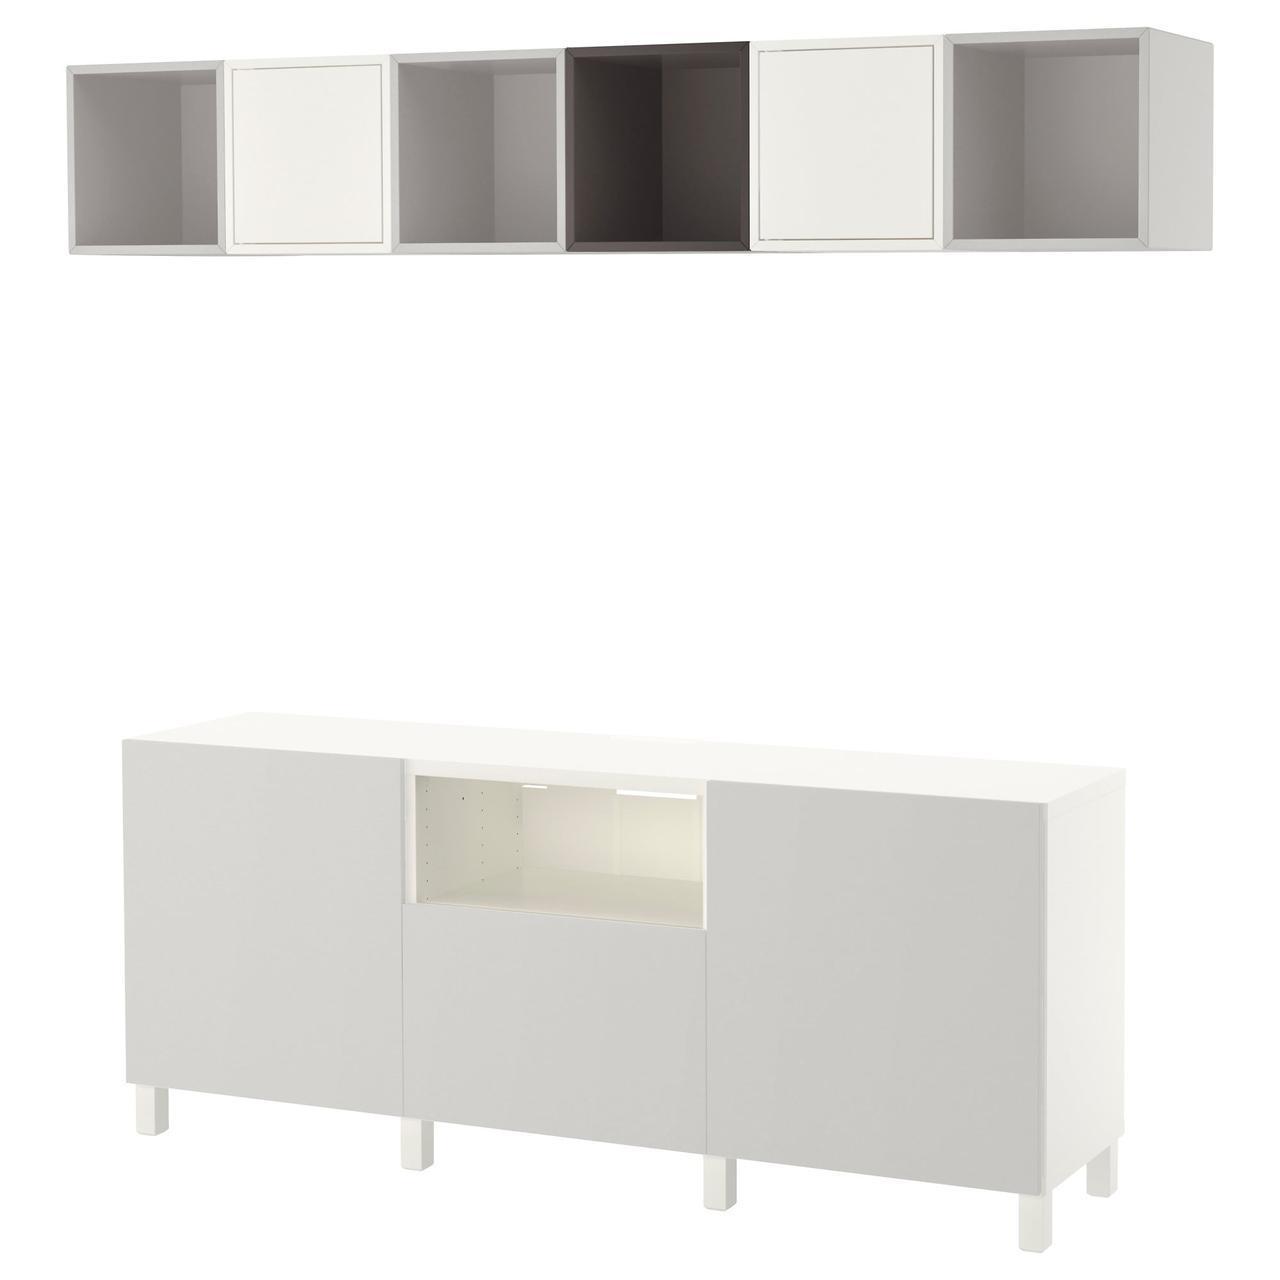 IKEA BESTA/EKET Тумба под телевизор с шкафчиками, белый/темно-серый, светло-серый  (392.211.52)